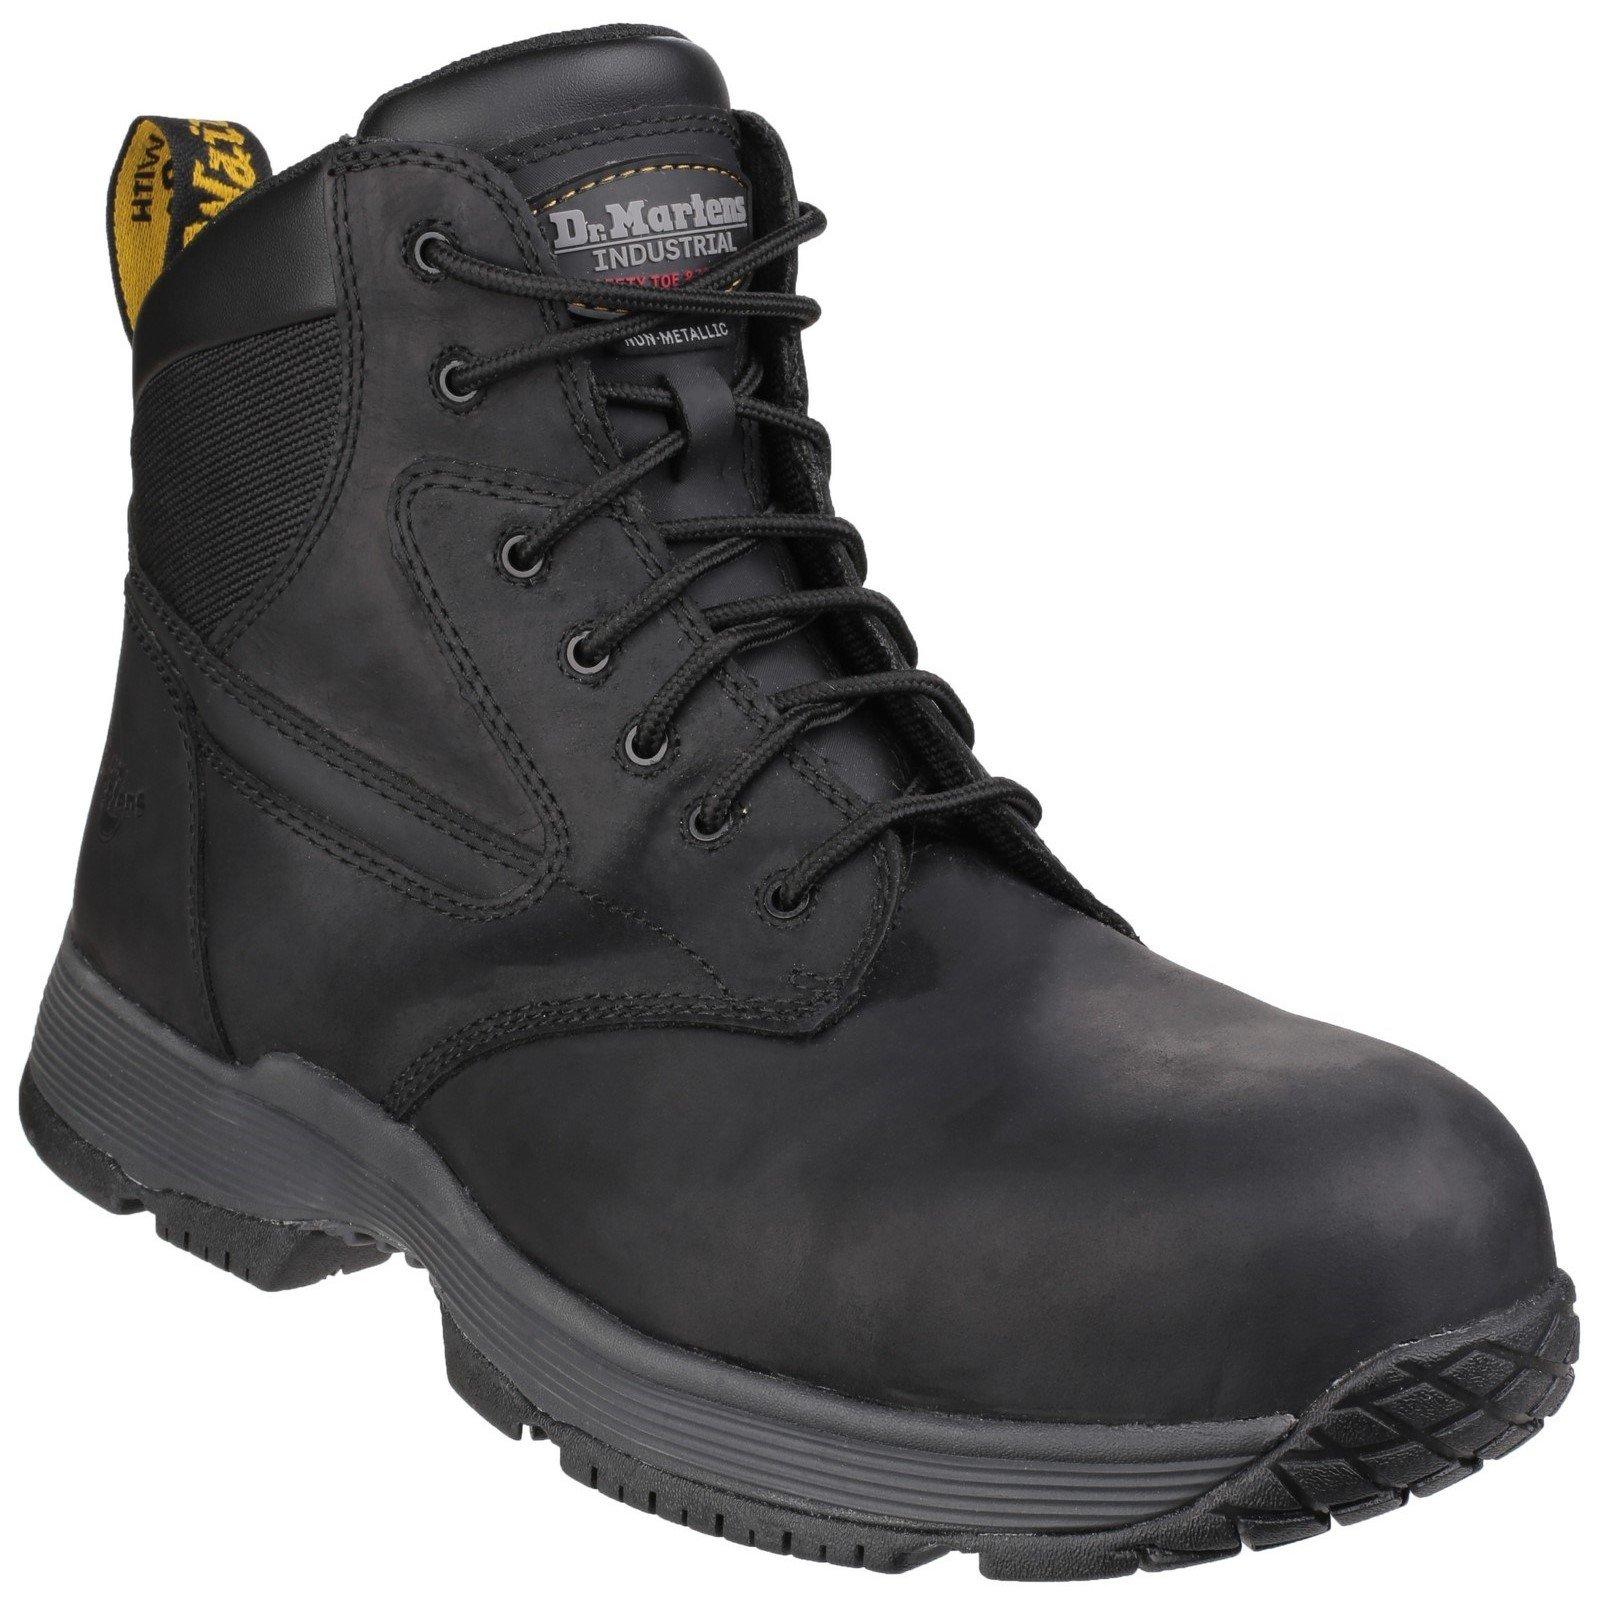 Dr Martens Unisex Corvid Composite Lace up Safety Boot Black 24862-41125 - Black 6